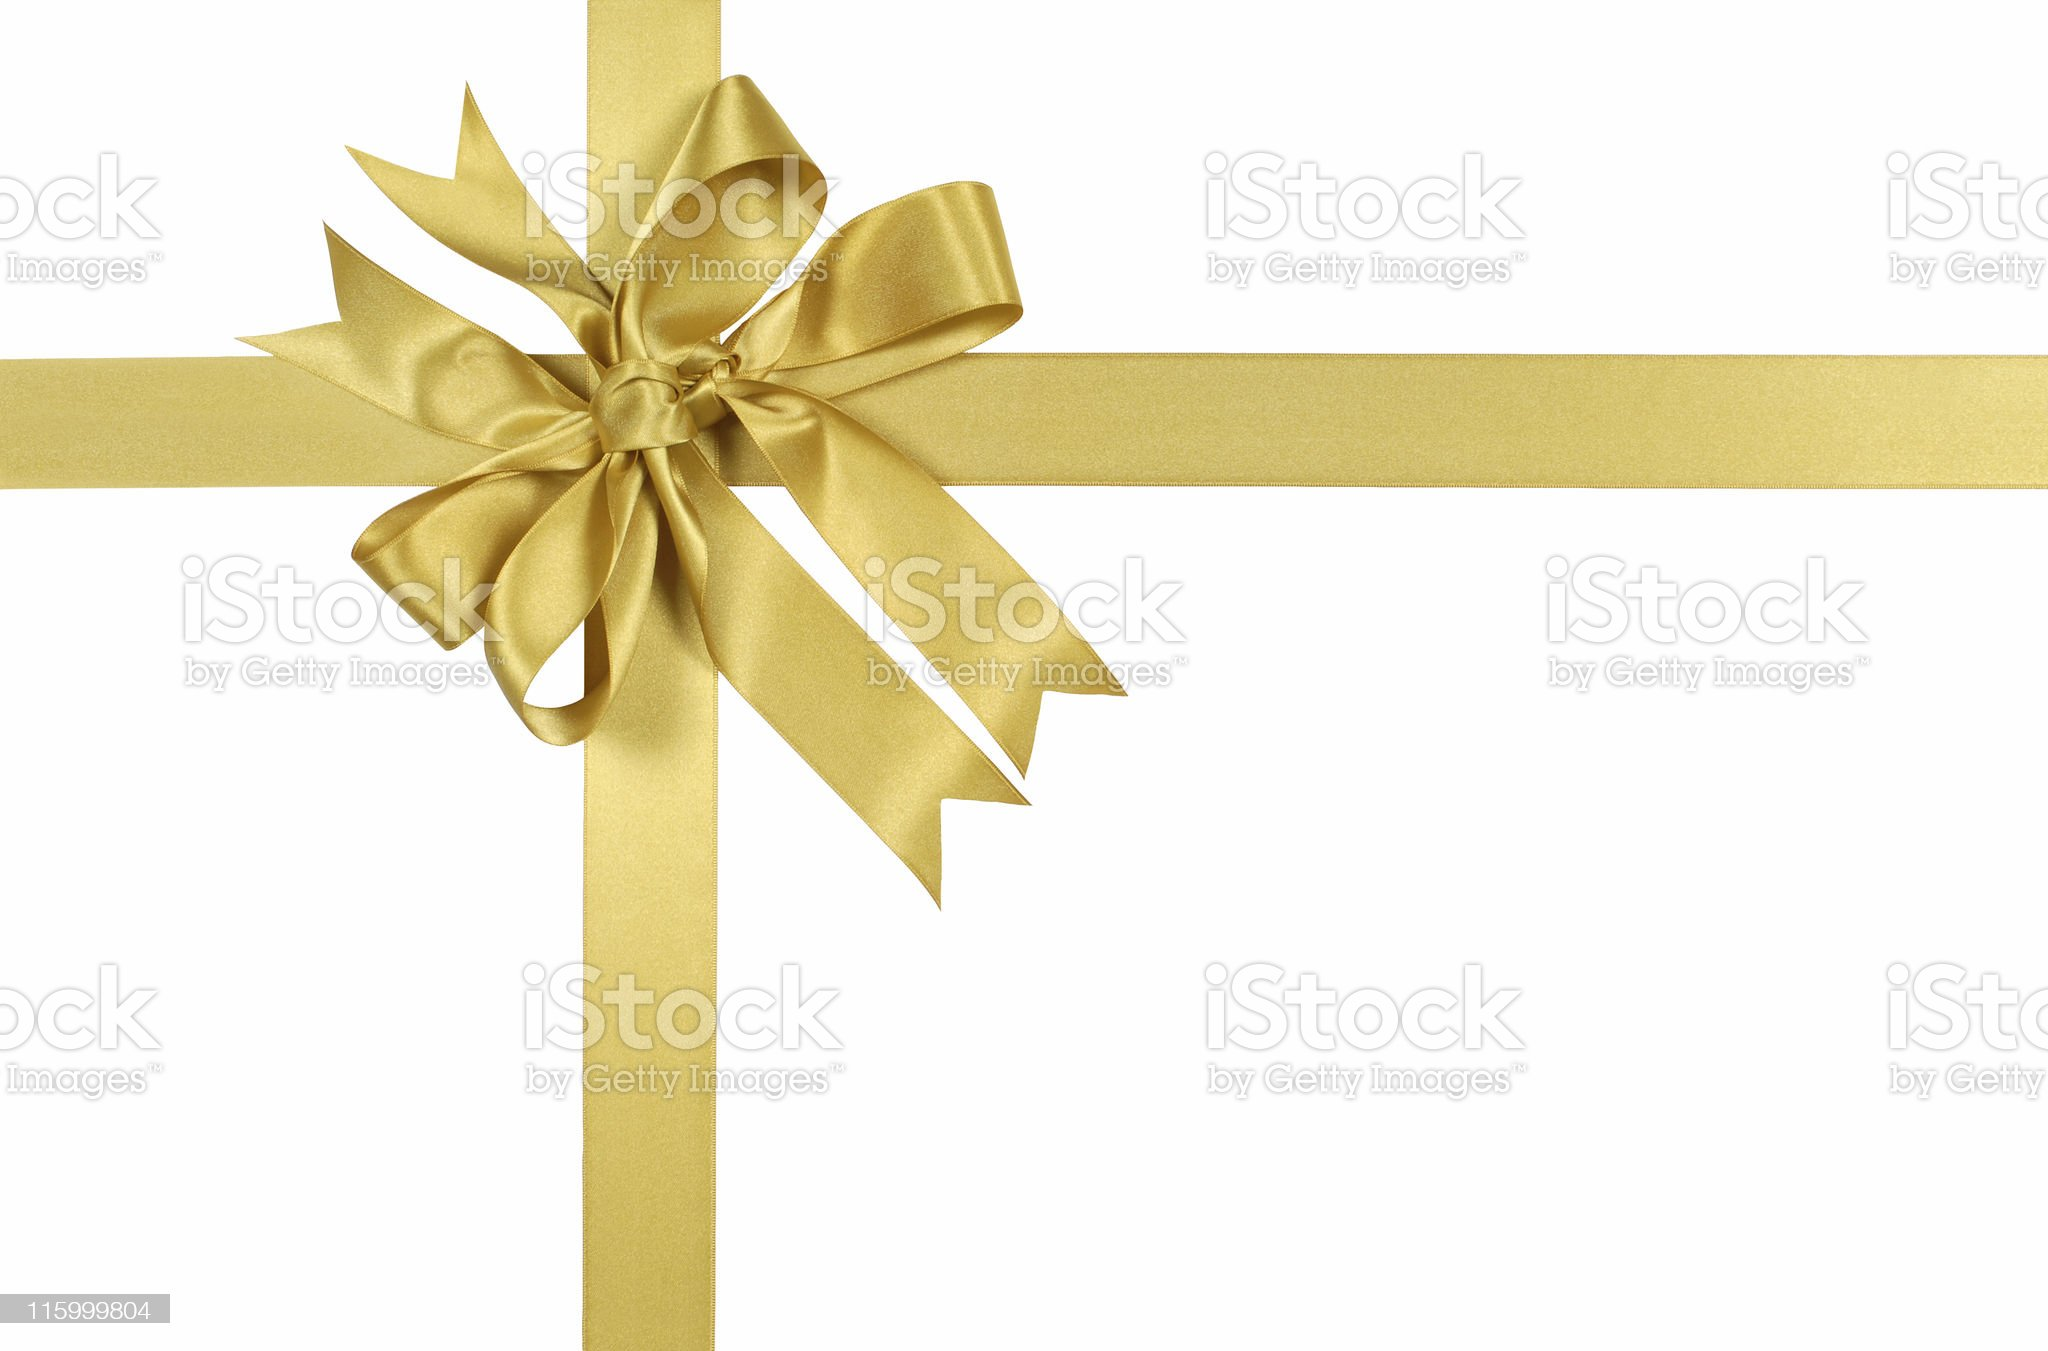 Yellow gold gift ribbon and bow royalty-free stock photo